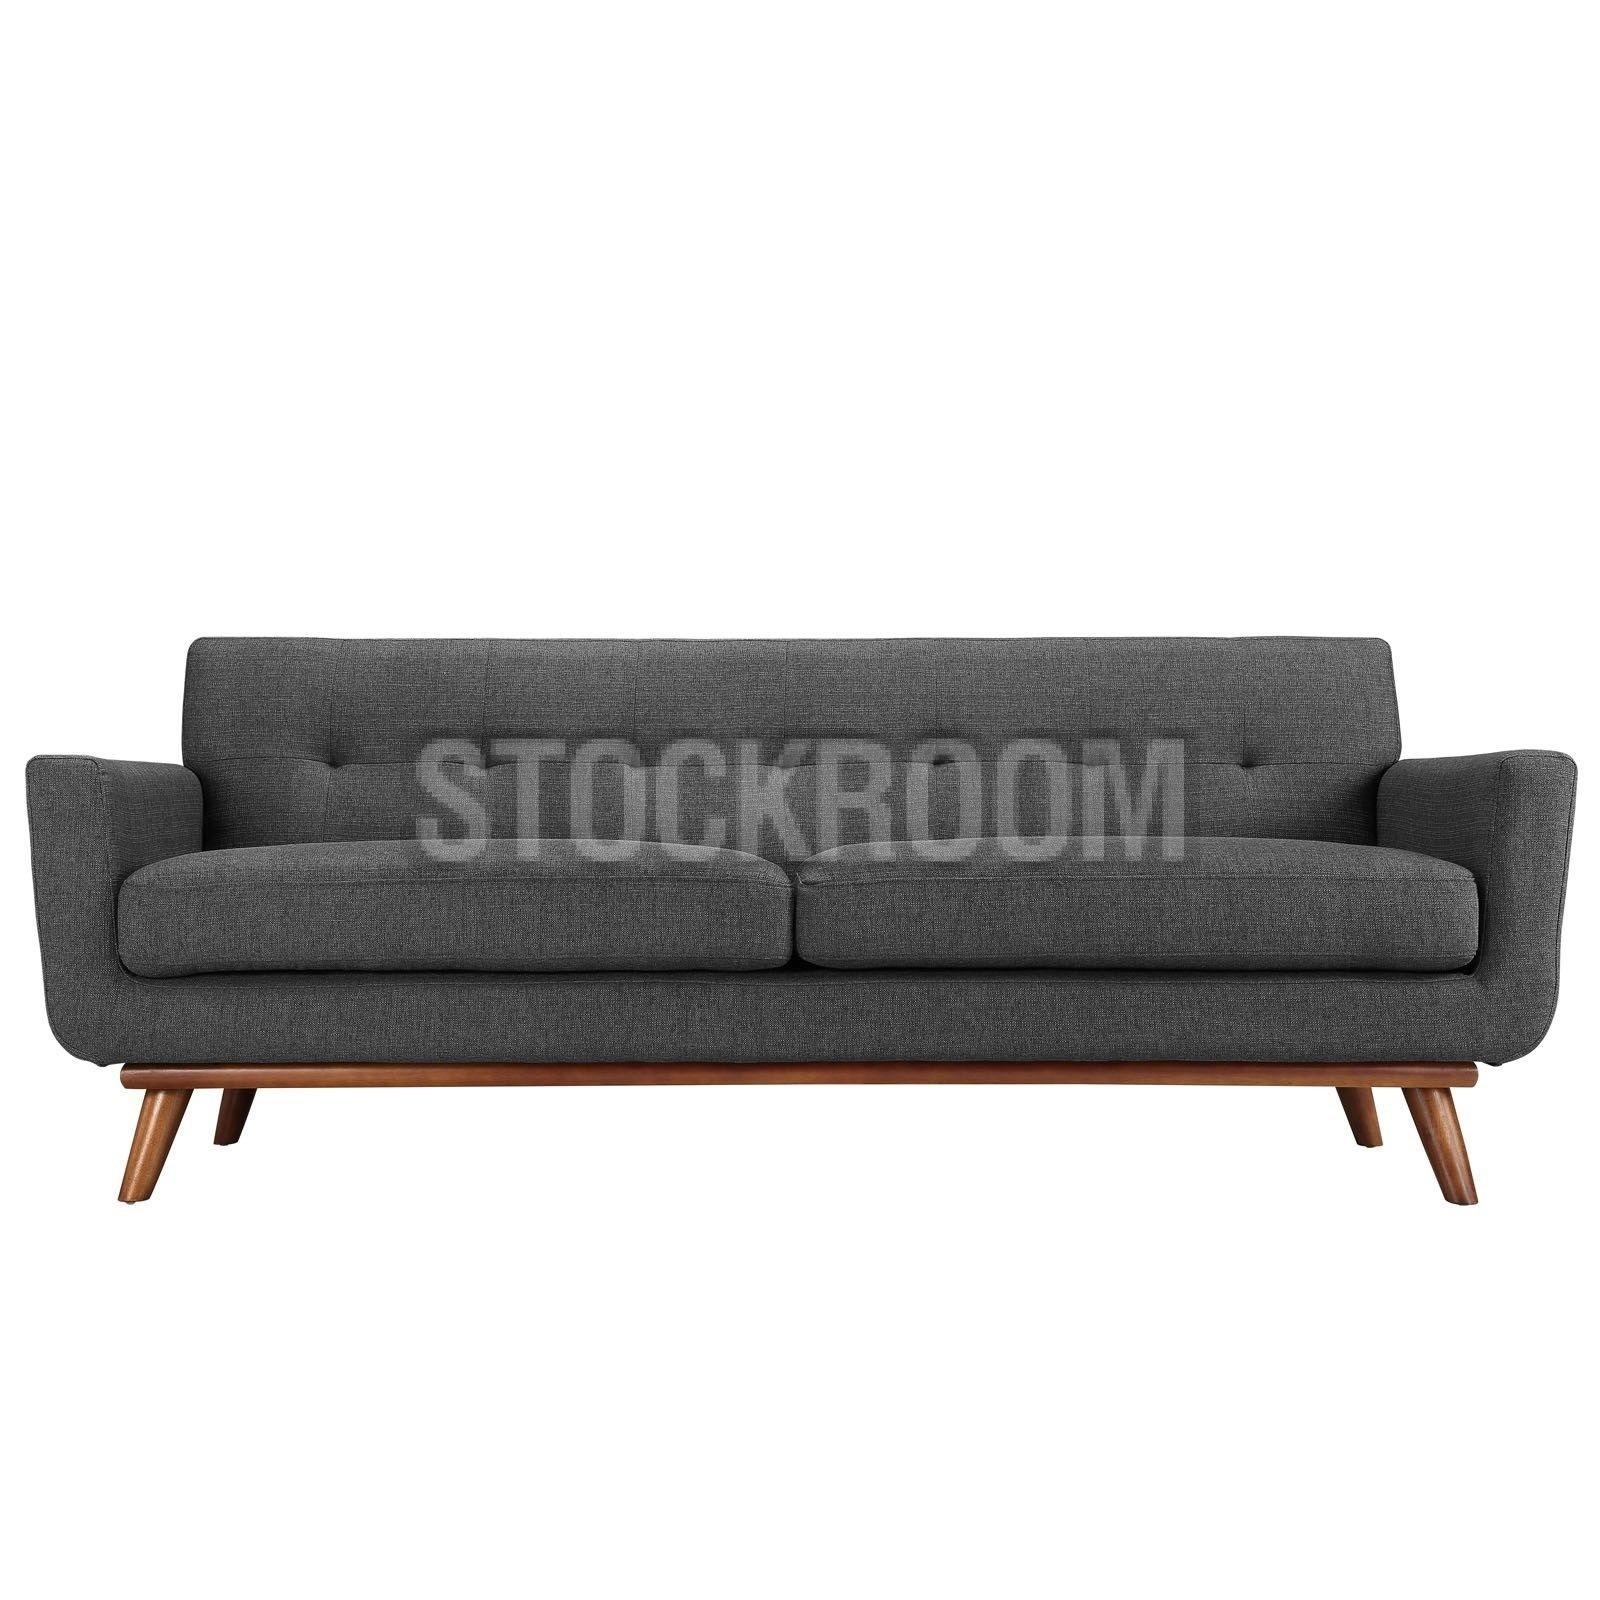 Aquarius Fabric Sofa 2 Seater : Stockroom Hong Kong Contemporary In Aquarius Dark Grey Sofa Chairs (Image 7 of 20)